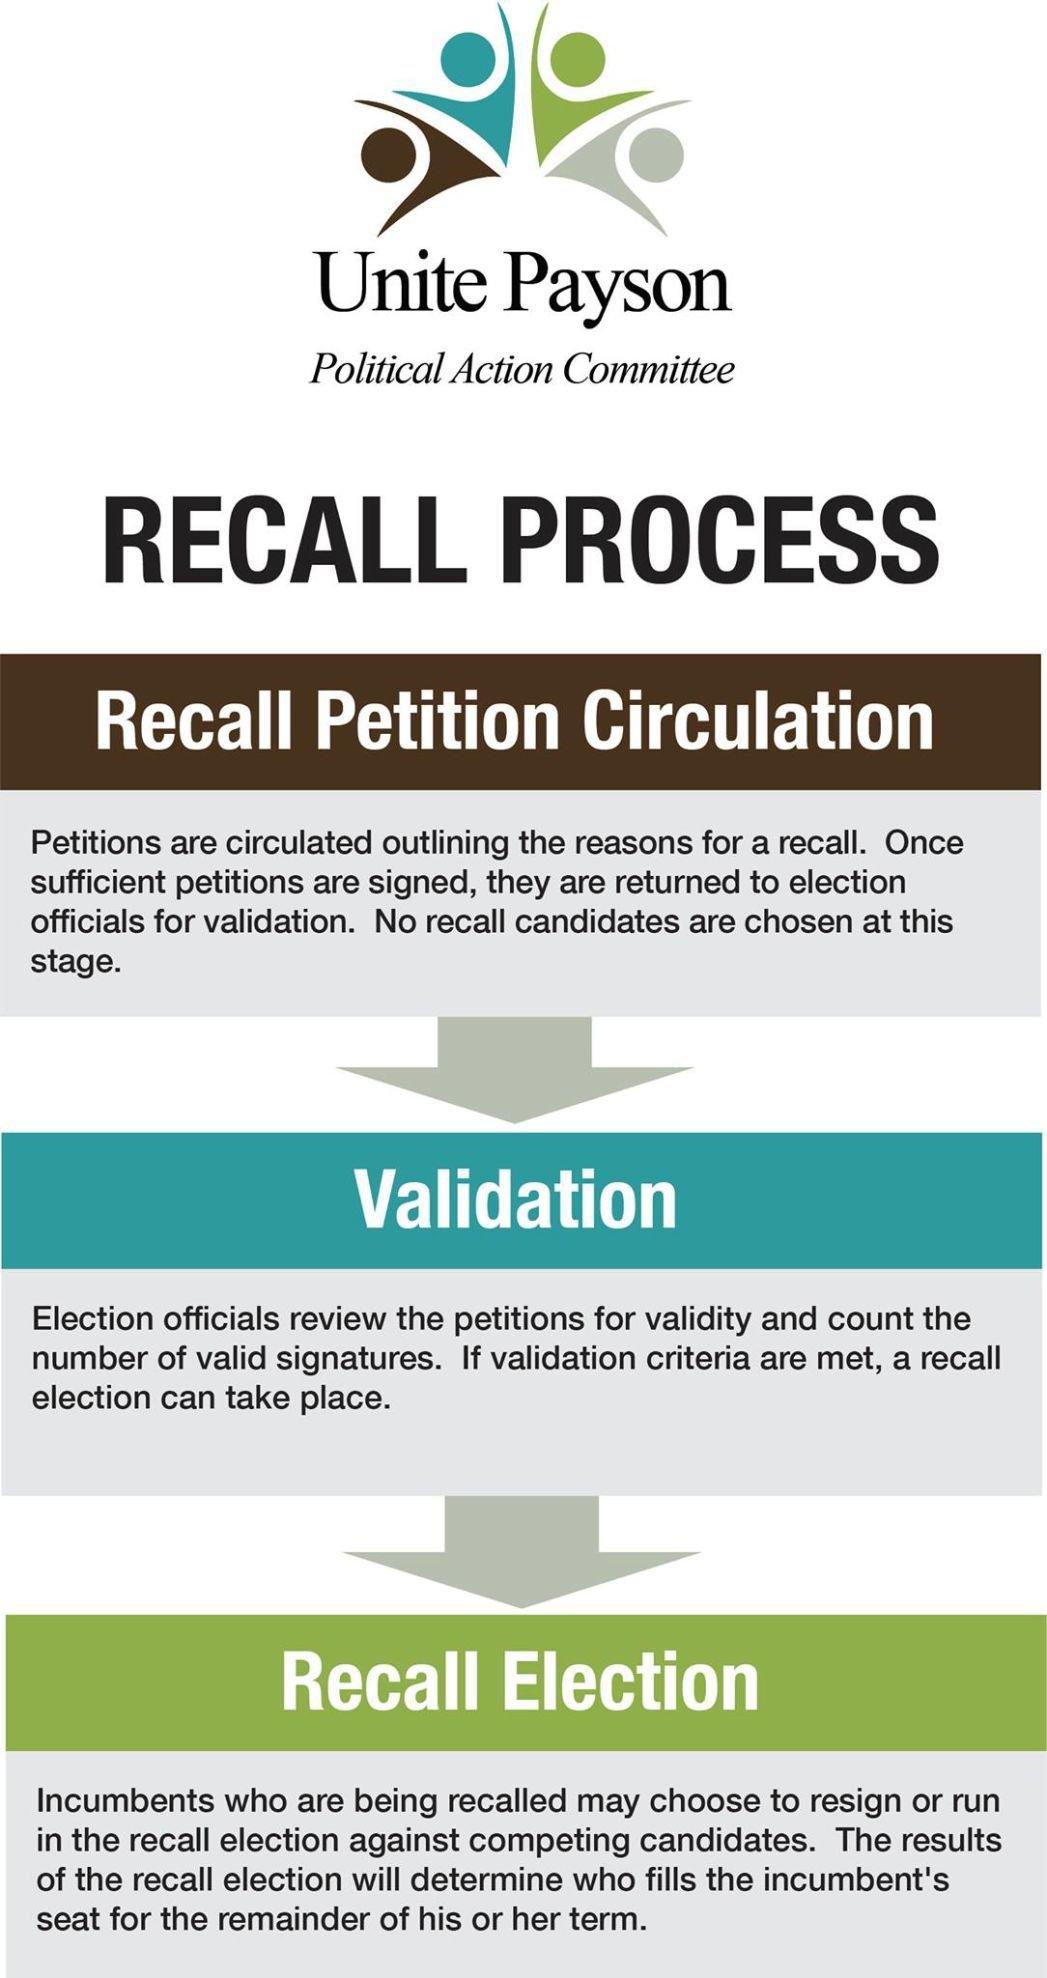 Recall process